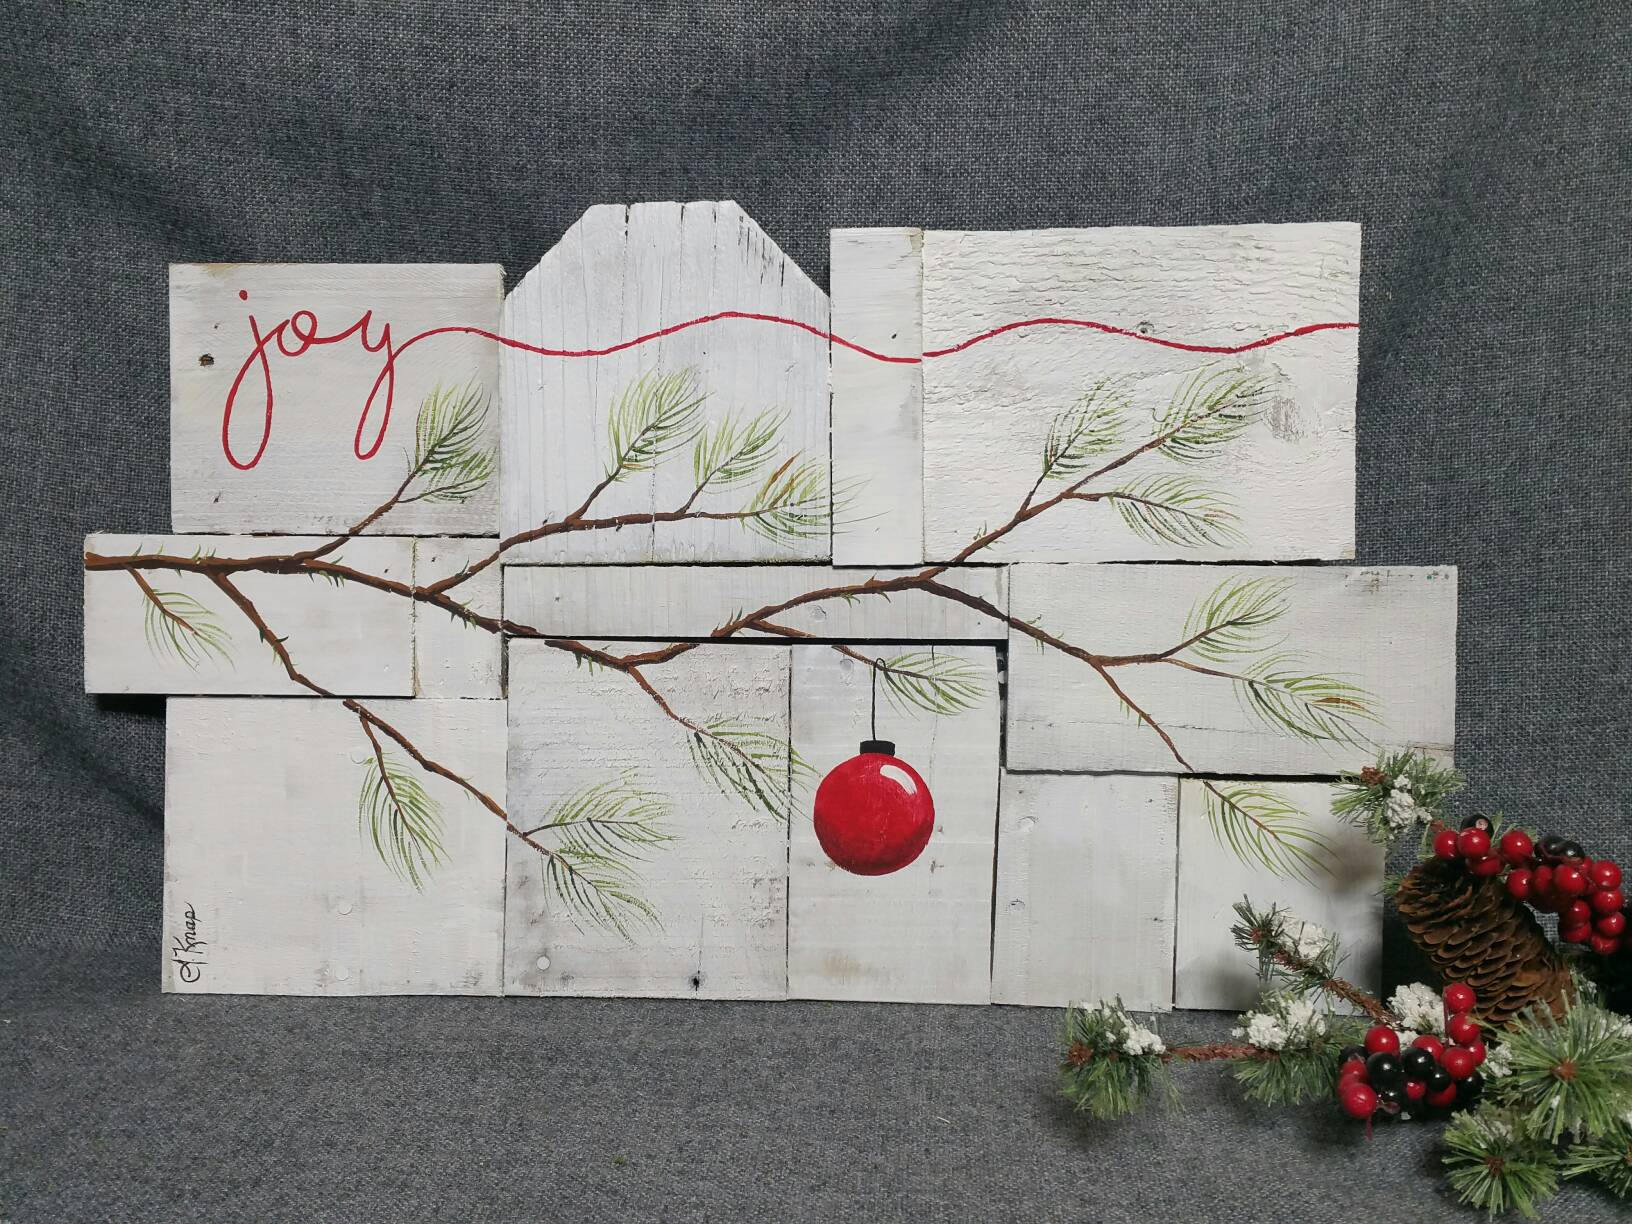 Rustic Christmas Decor Christmas Joy Pallet Art Farmhouse Decor White Wash Wood One Of A Kind Hand Painted Shabby